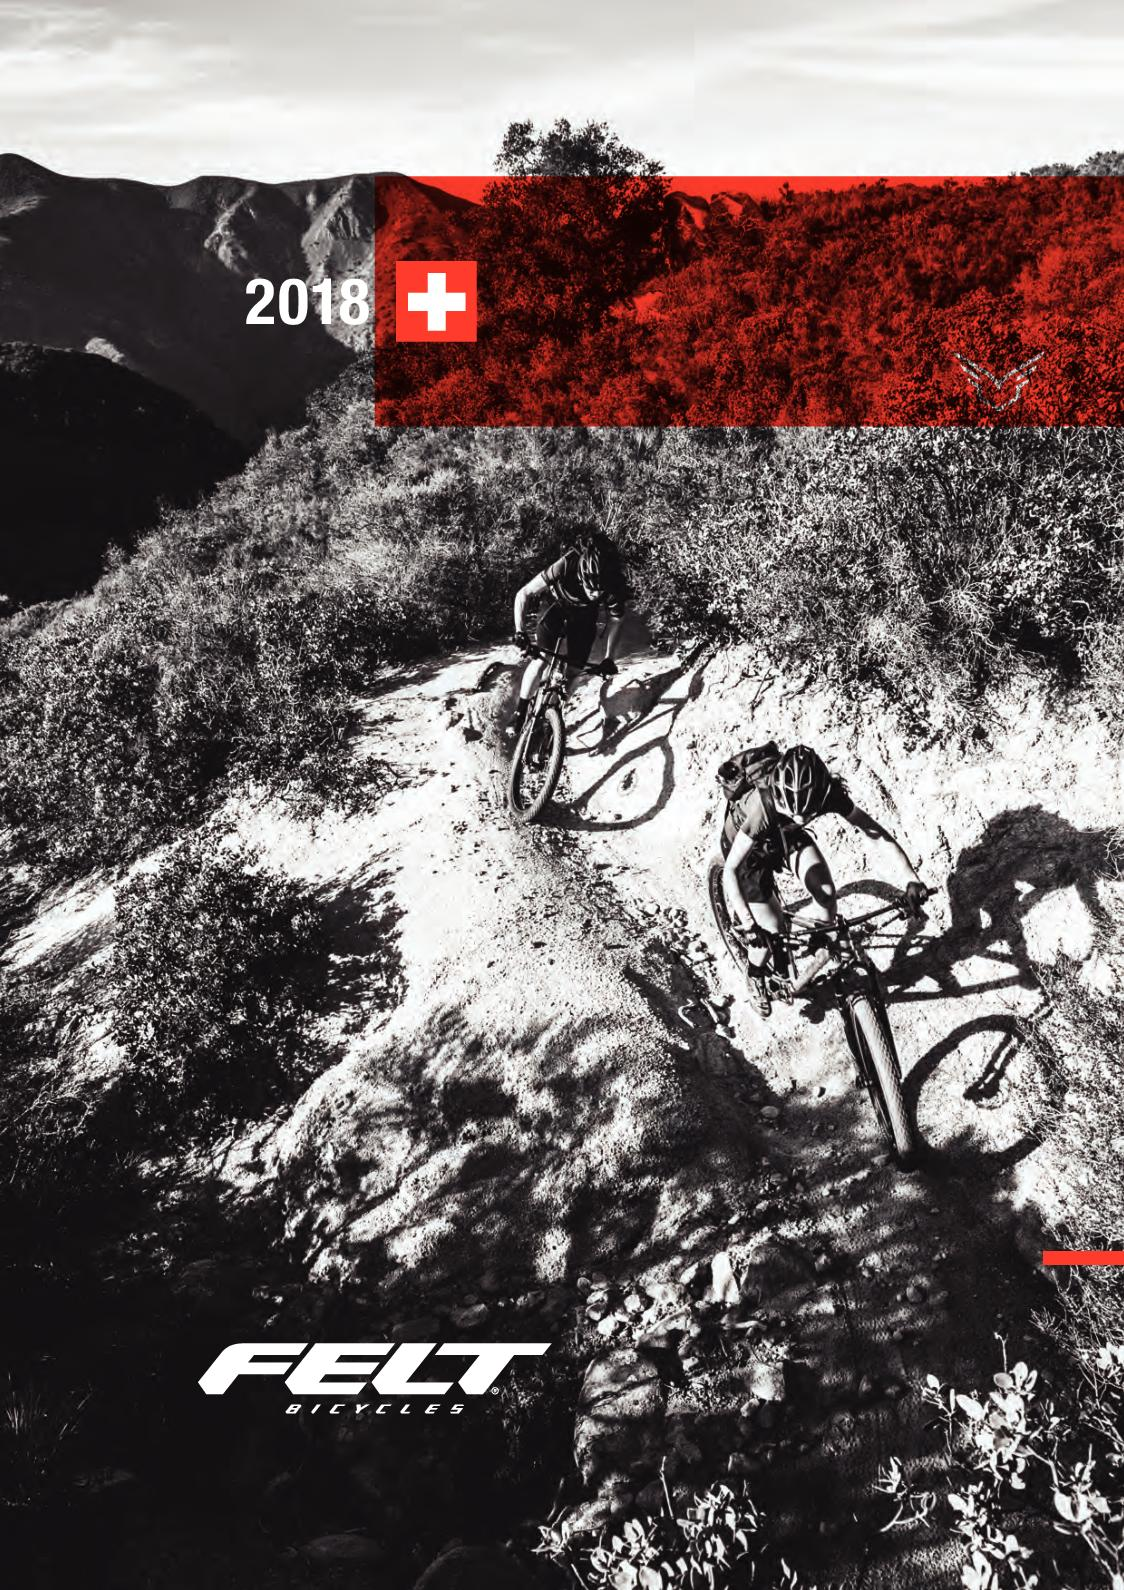 FELT Alloy Lock-On Comfort Bicycle XC MTB Bike Gel Handlebar Grips